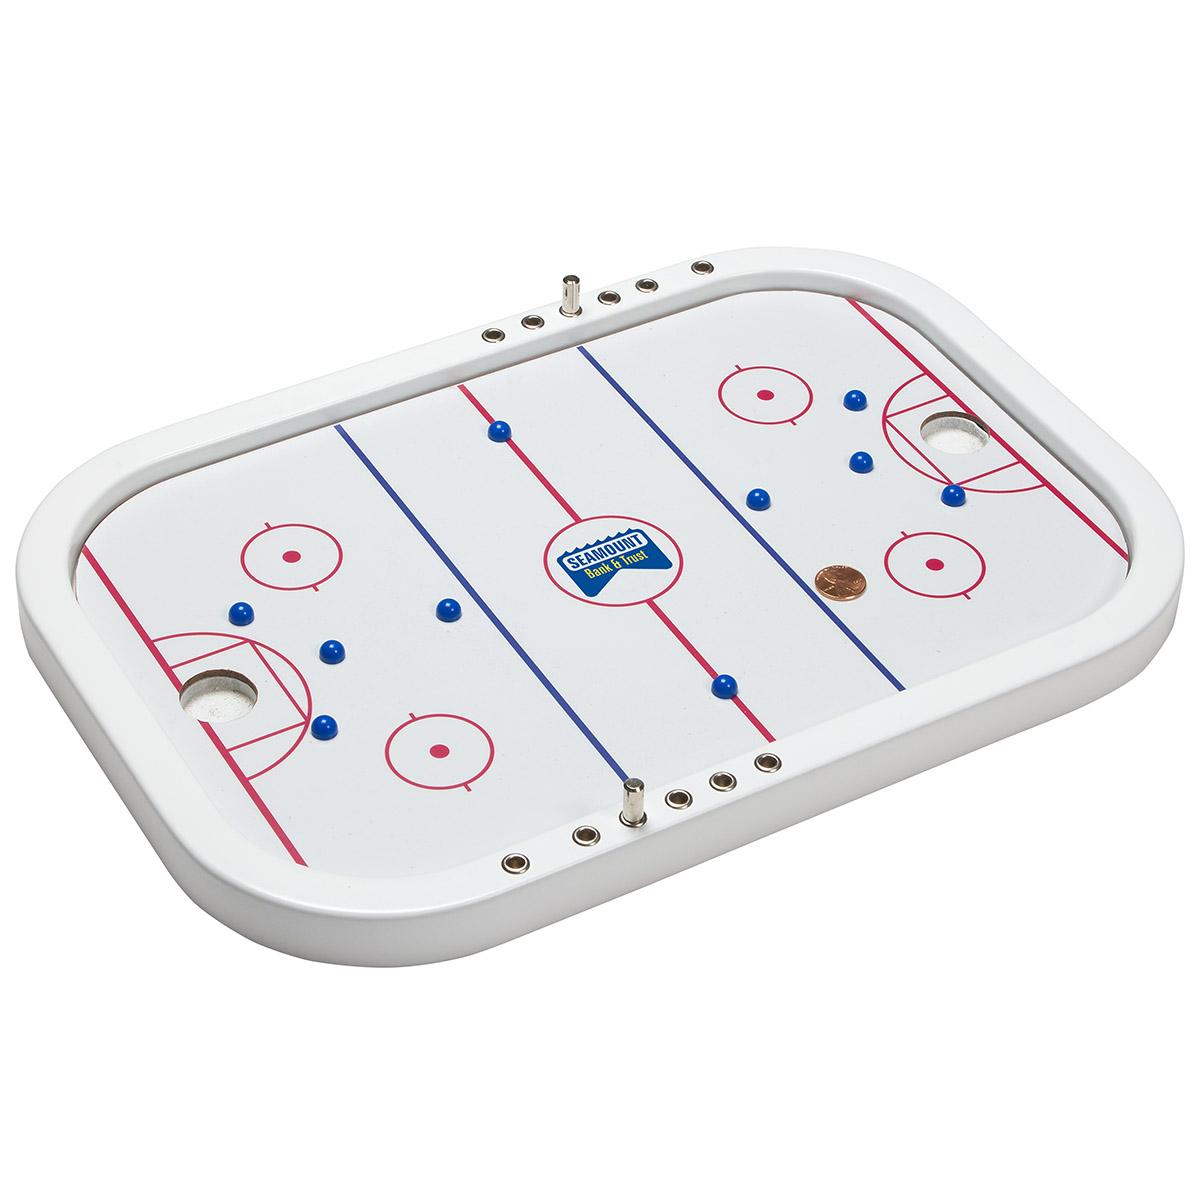 Penny Hockey Executive Wooden Board Game, WAB-PH18, Full Colour Imprint